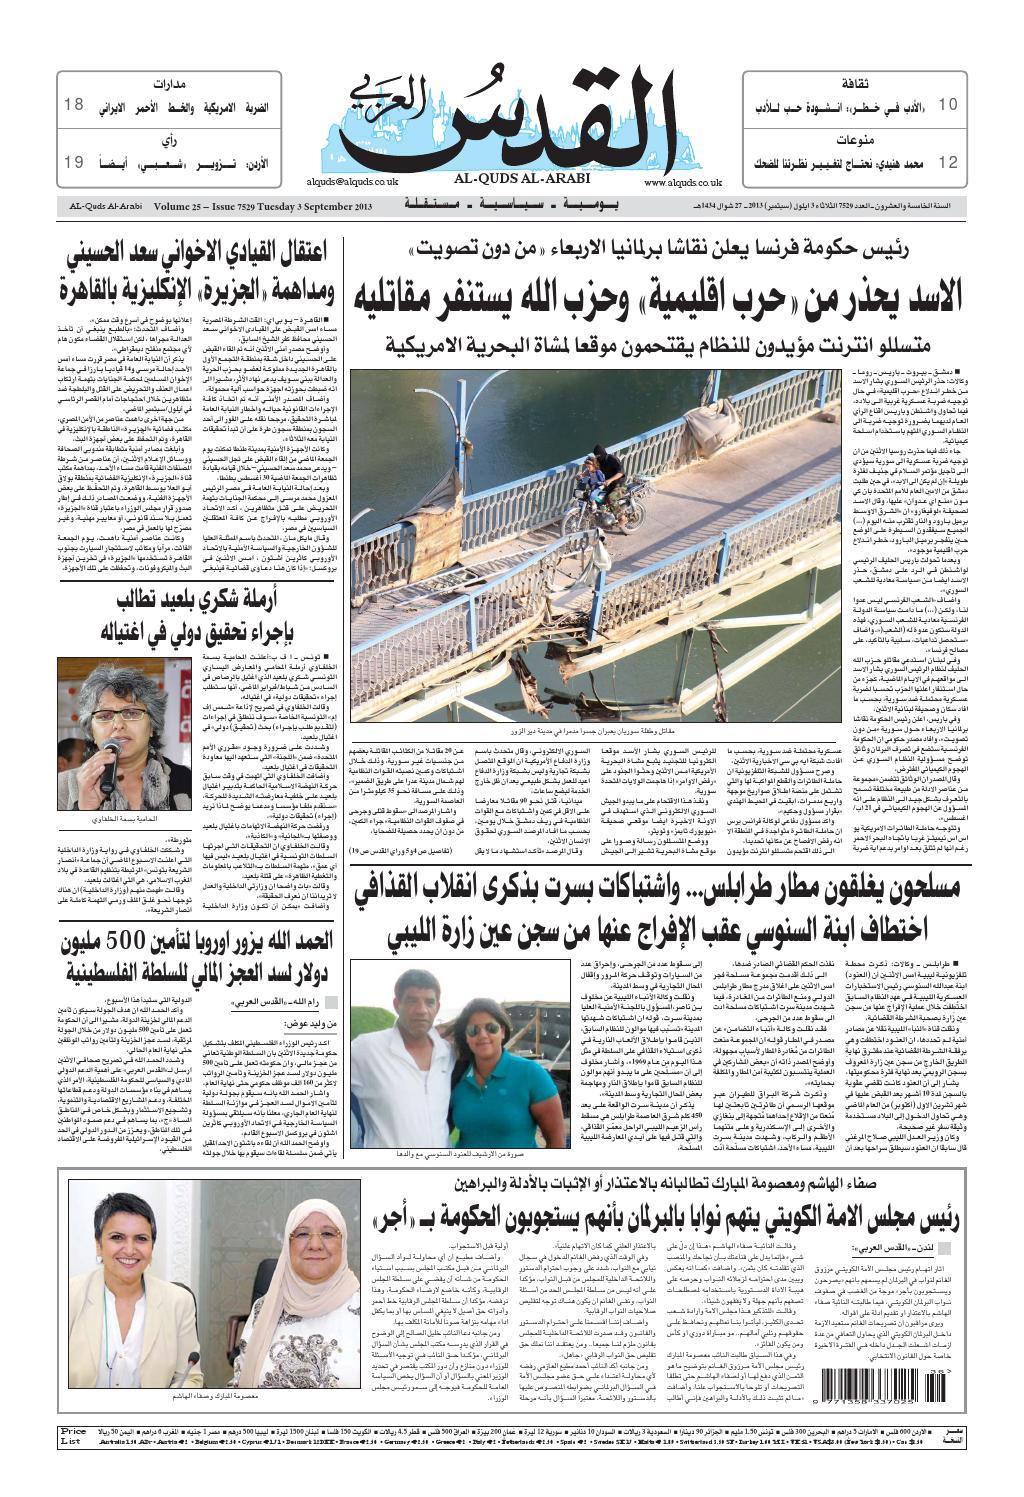 c2570a473 صحيفة القدس العربي , الثلاثاء 03.09.2013 by مركز الحدث - issuu